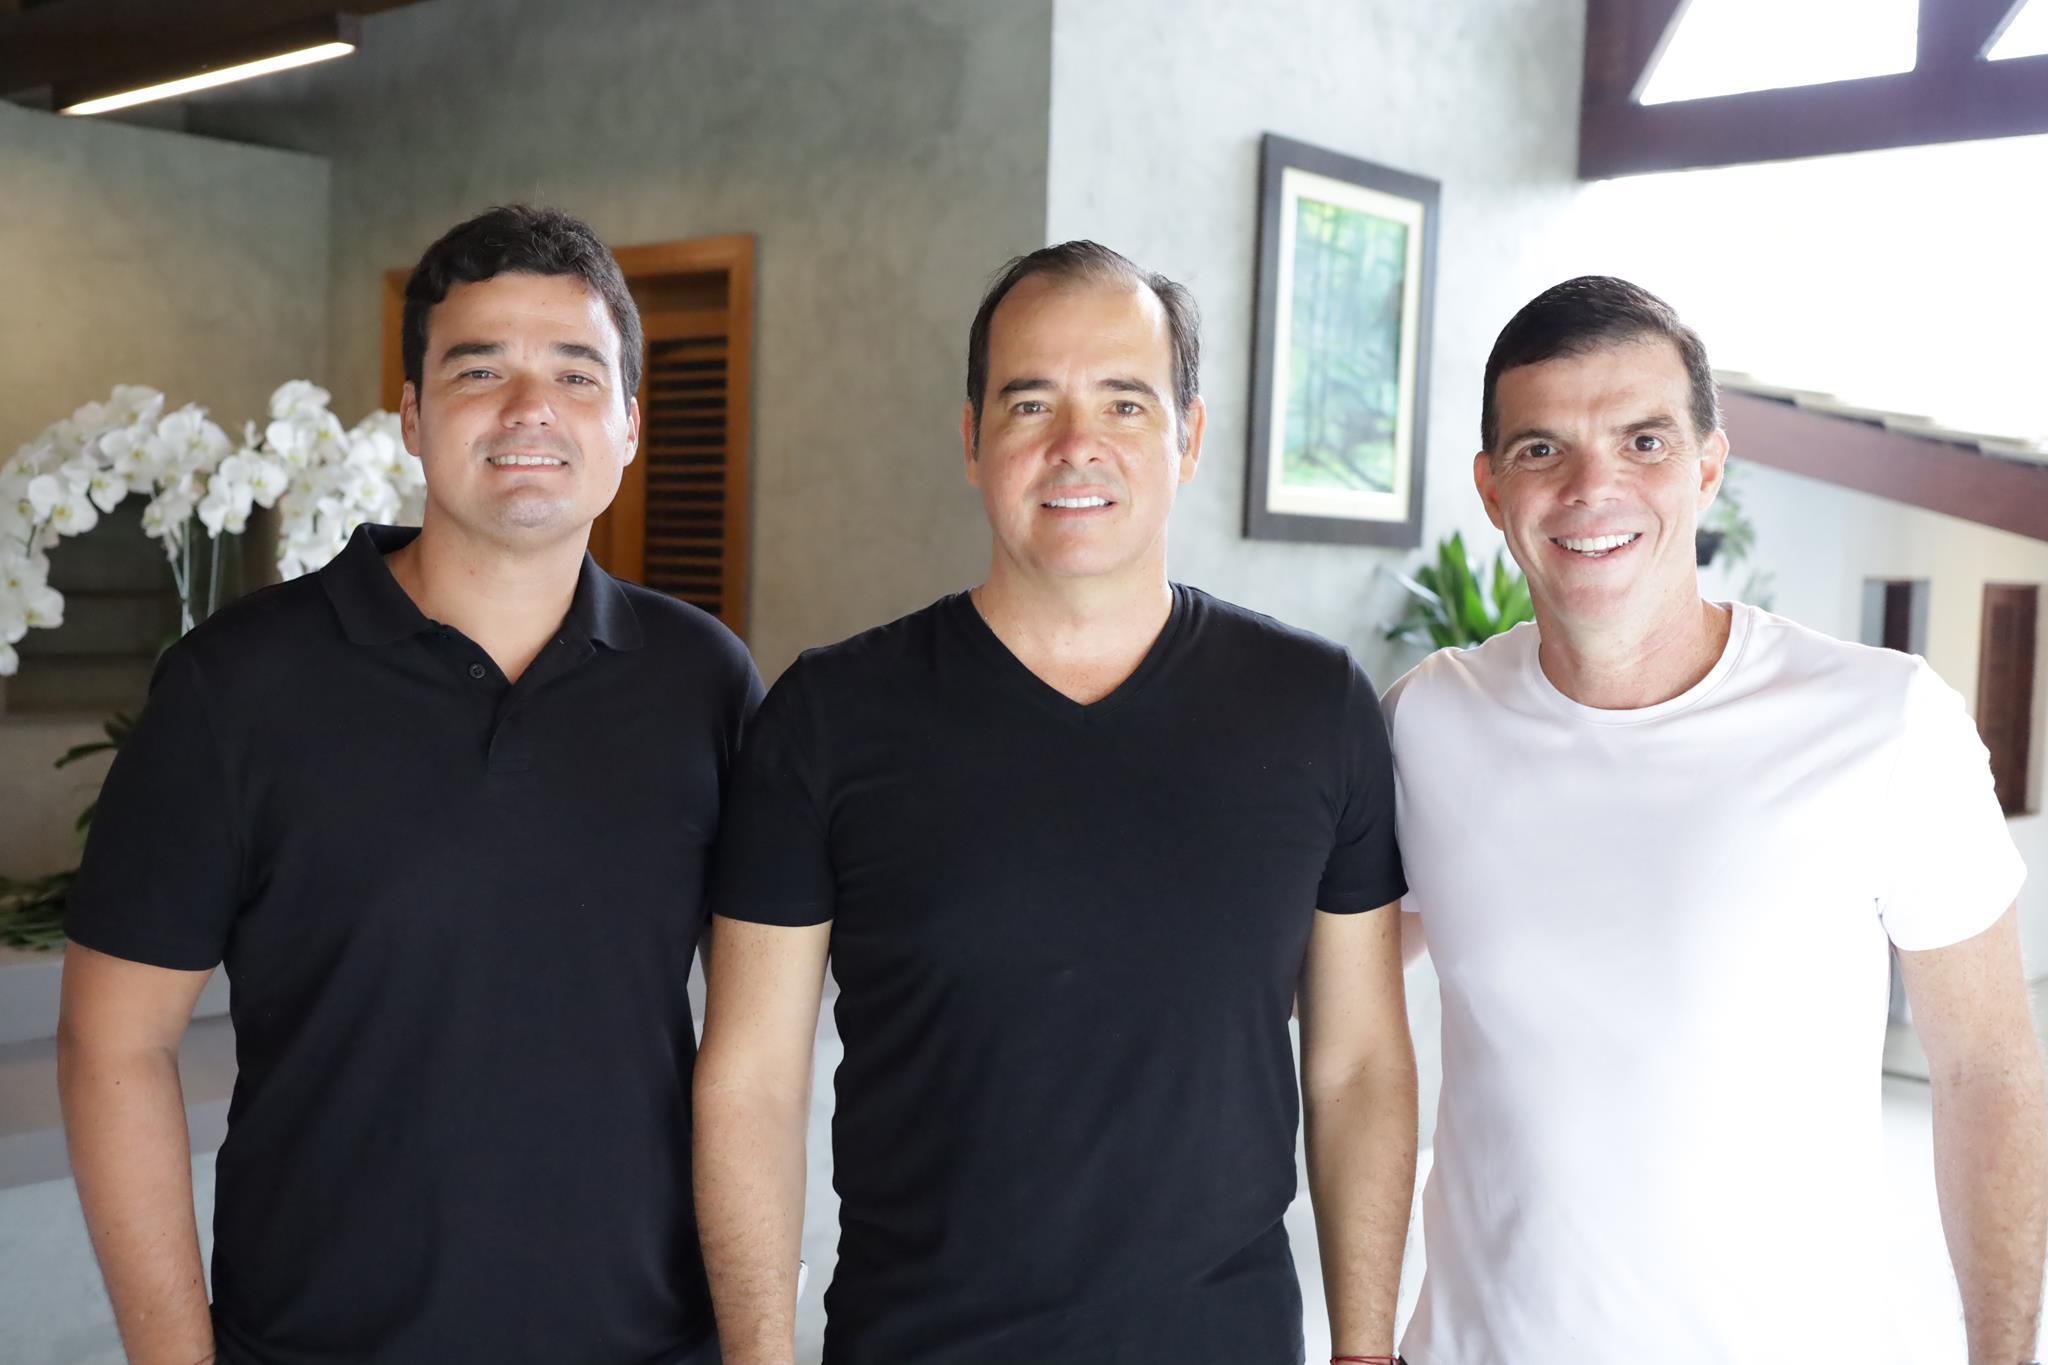 Nelson Valenca Daniel Silveira E Lourenco Bizzaria 2